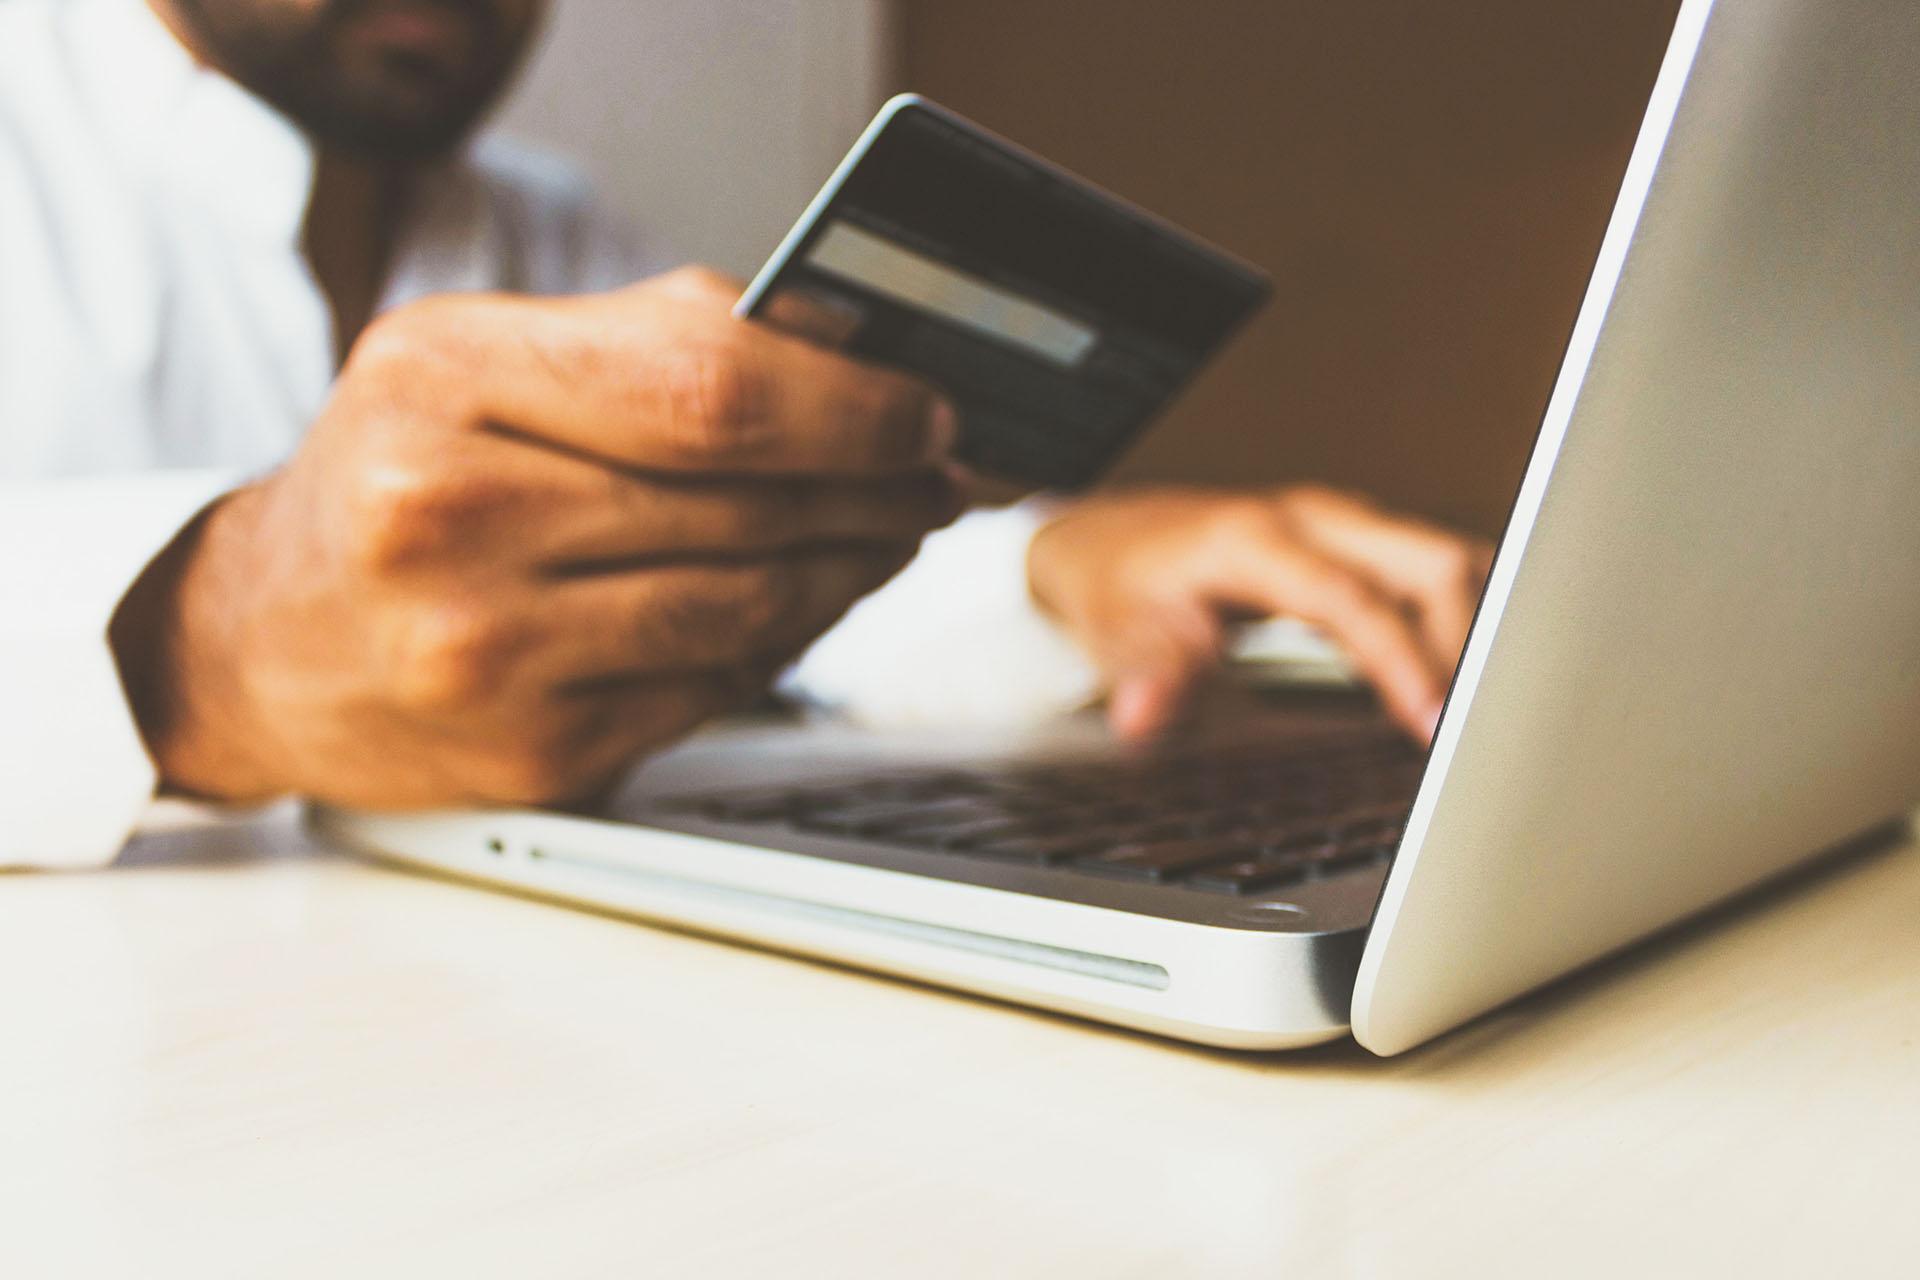 Man buying something with a credit card online. Photo byrupixen.comonUnsplash.